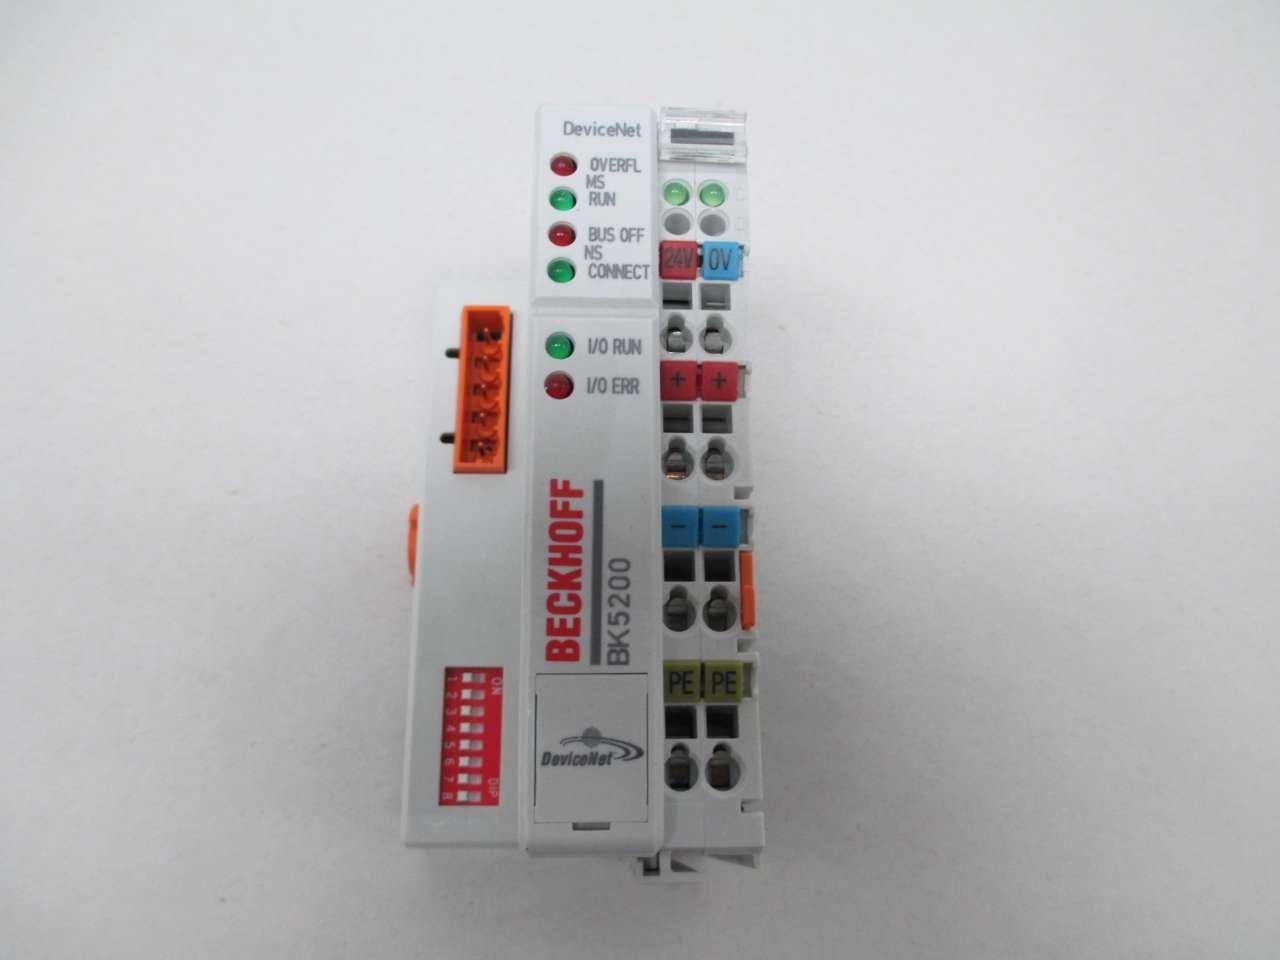 Beckhoff BK5220 DeviceNet Bus Coupler 24VDC NEU